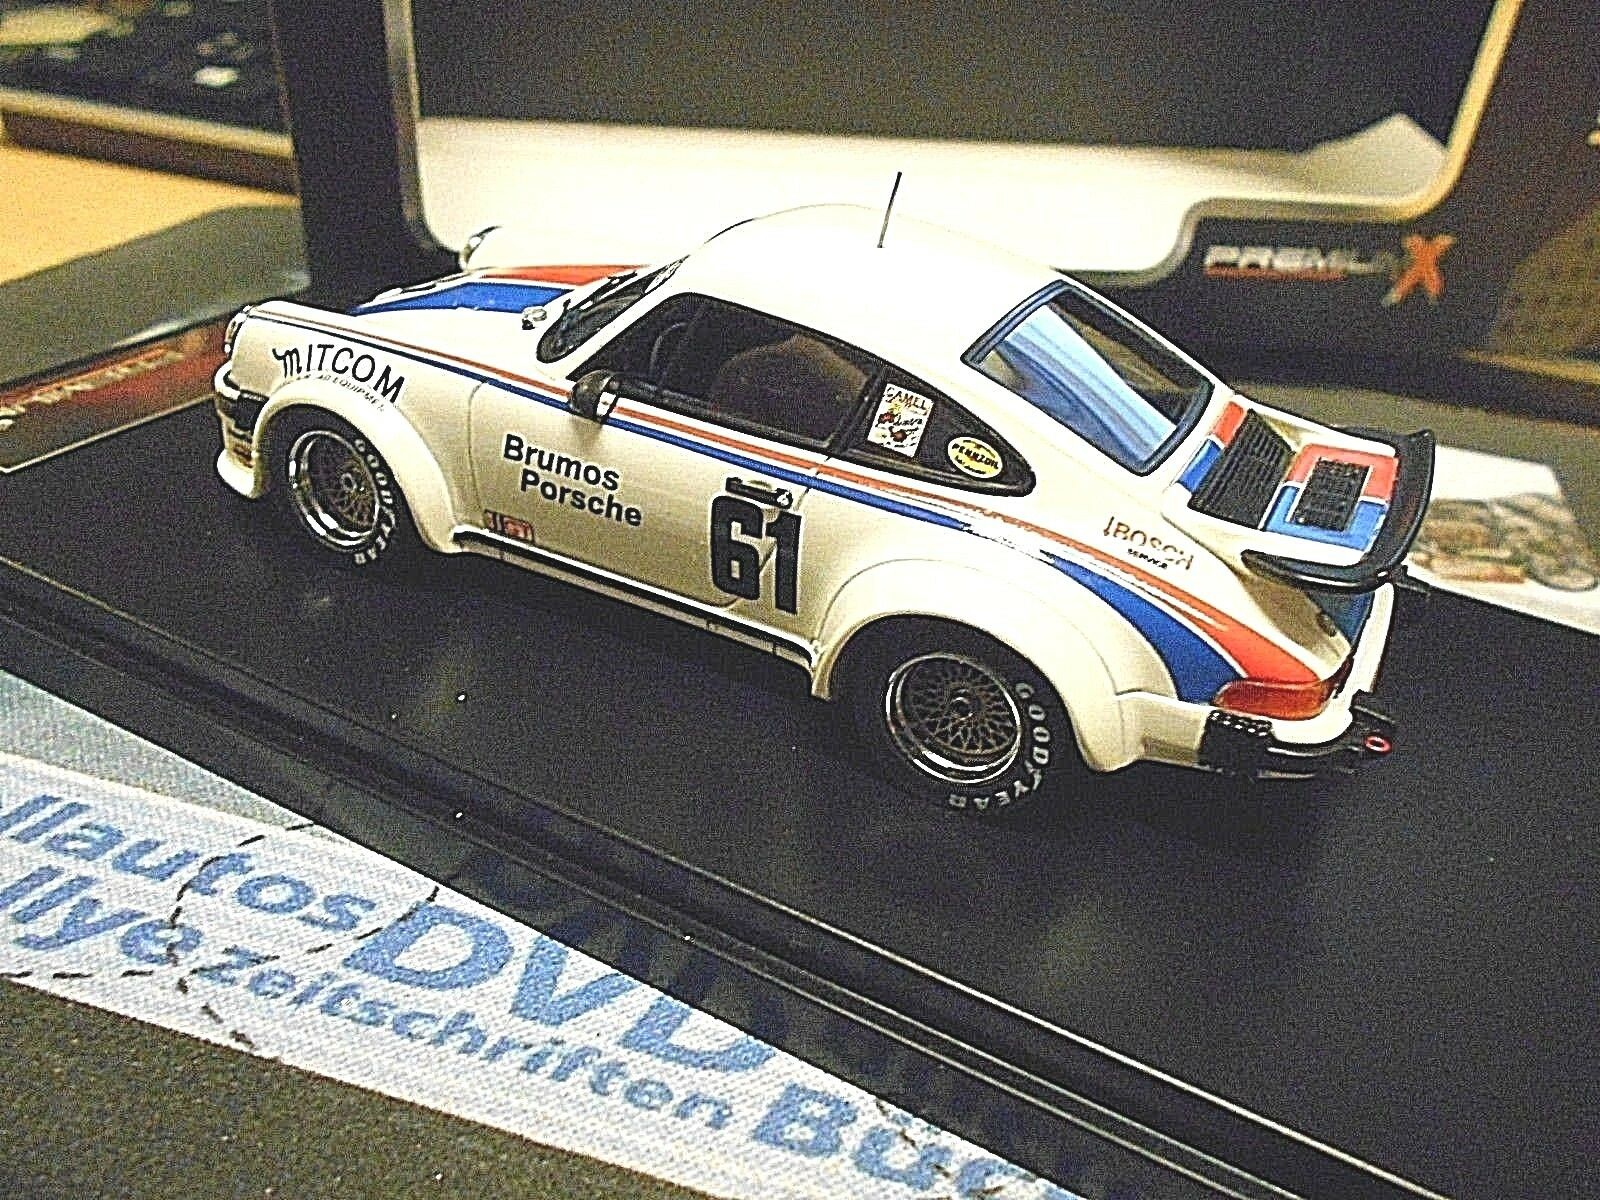 Porsche 911 934 Turbo Daytona 1977  61 Brumos Gregg Superproduction IXO PREMIUM X SP 1 43